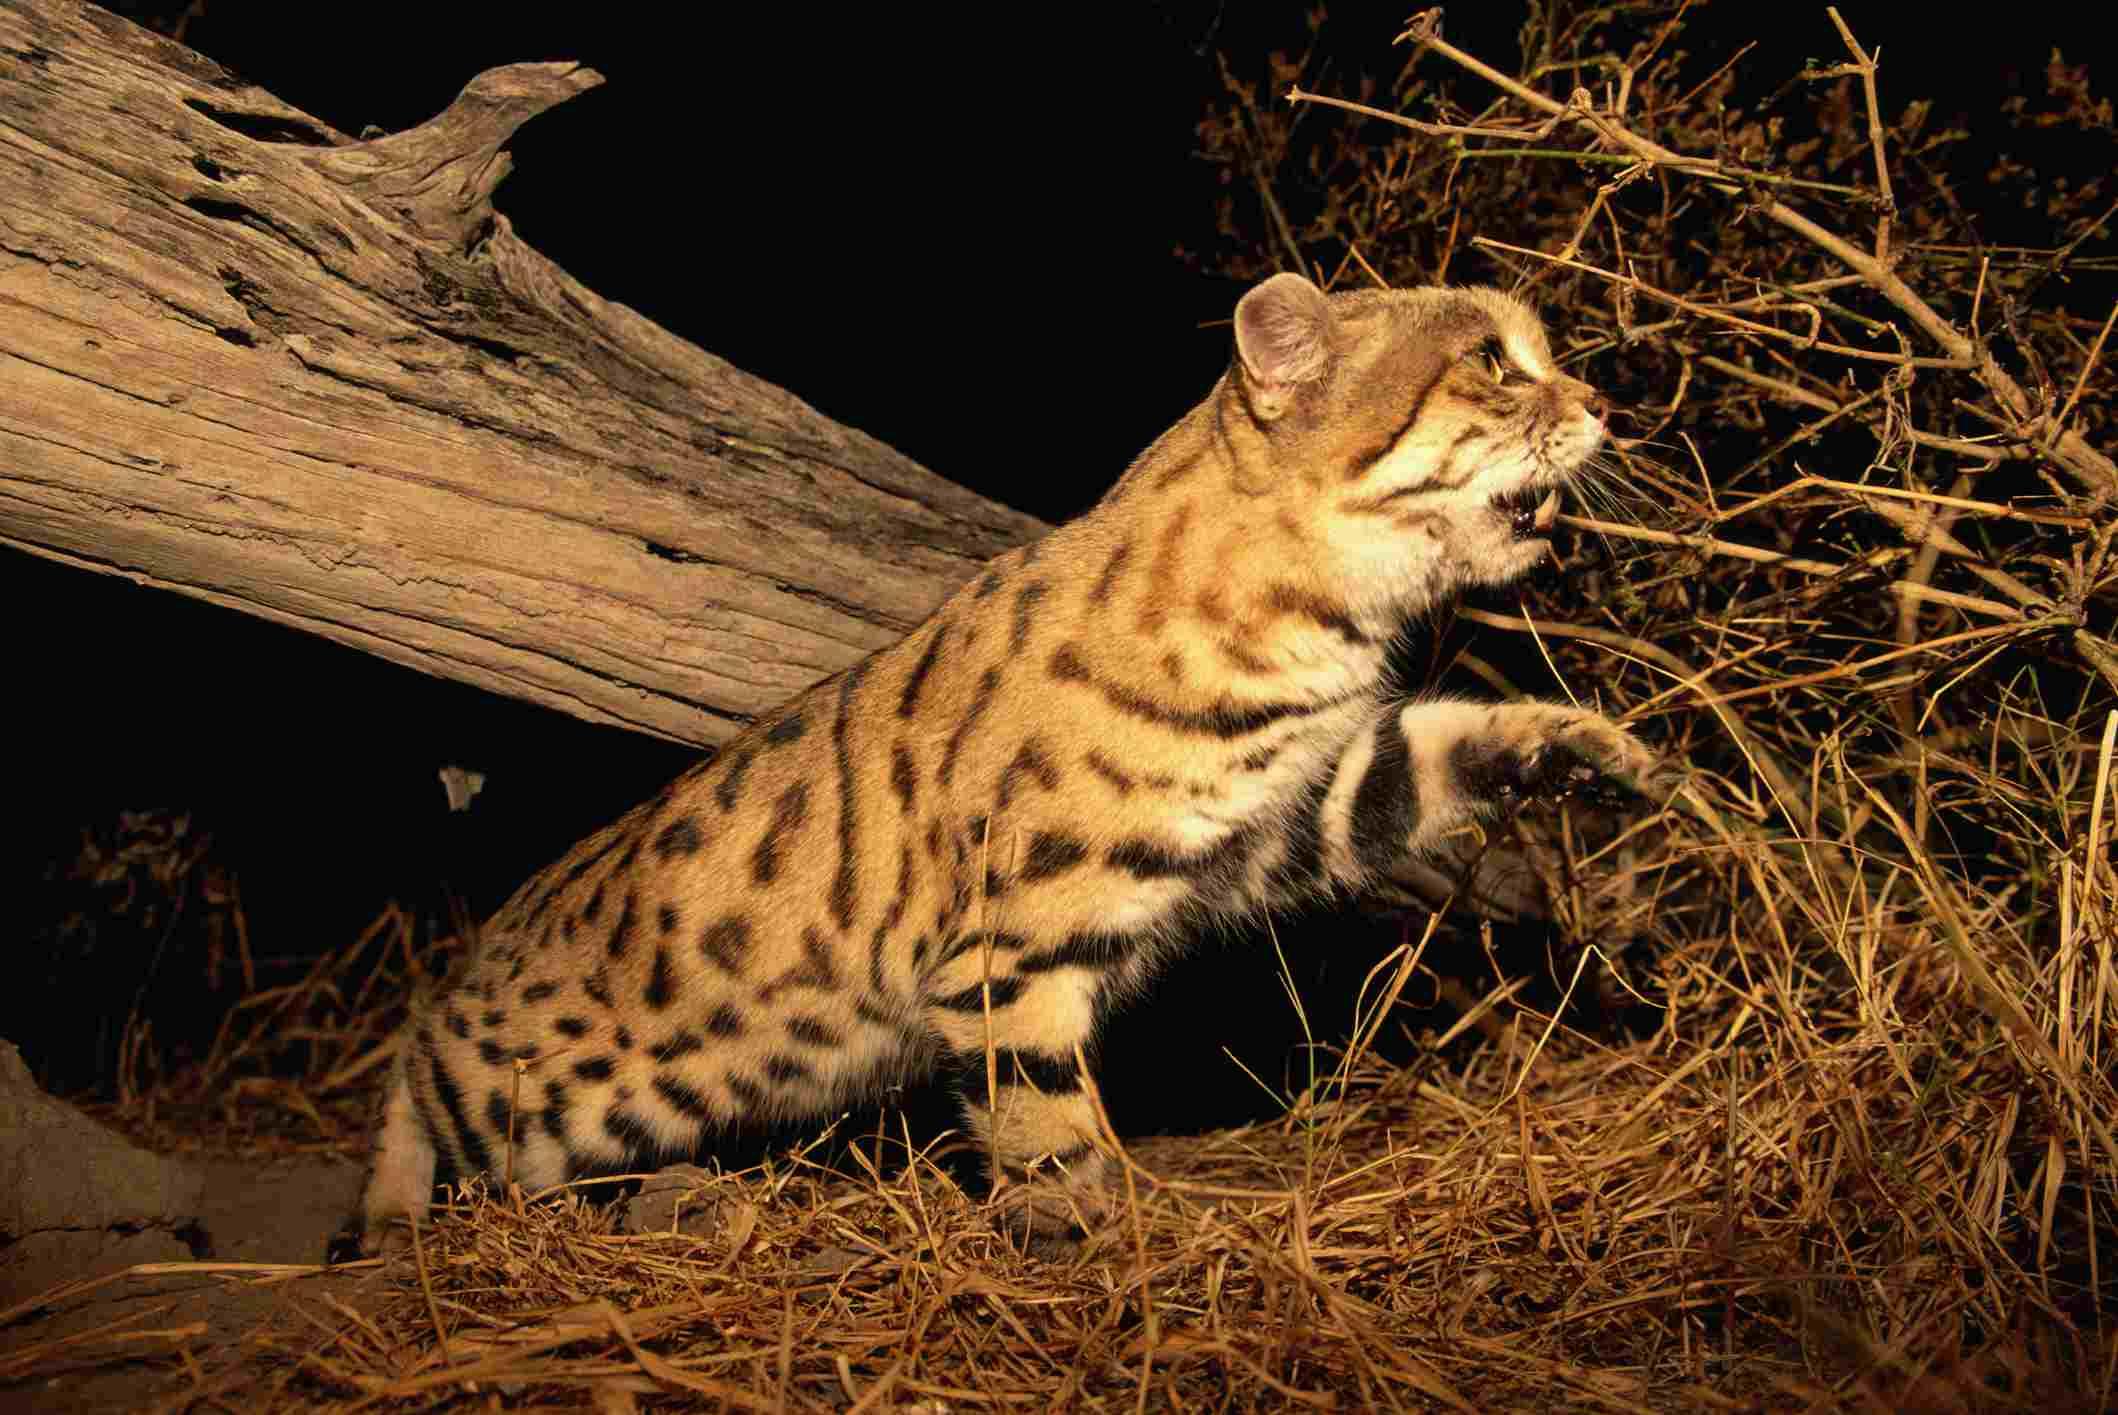 Андская горная кошка: описание, внешний вид, характер, ареал и среда обитания, фото